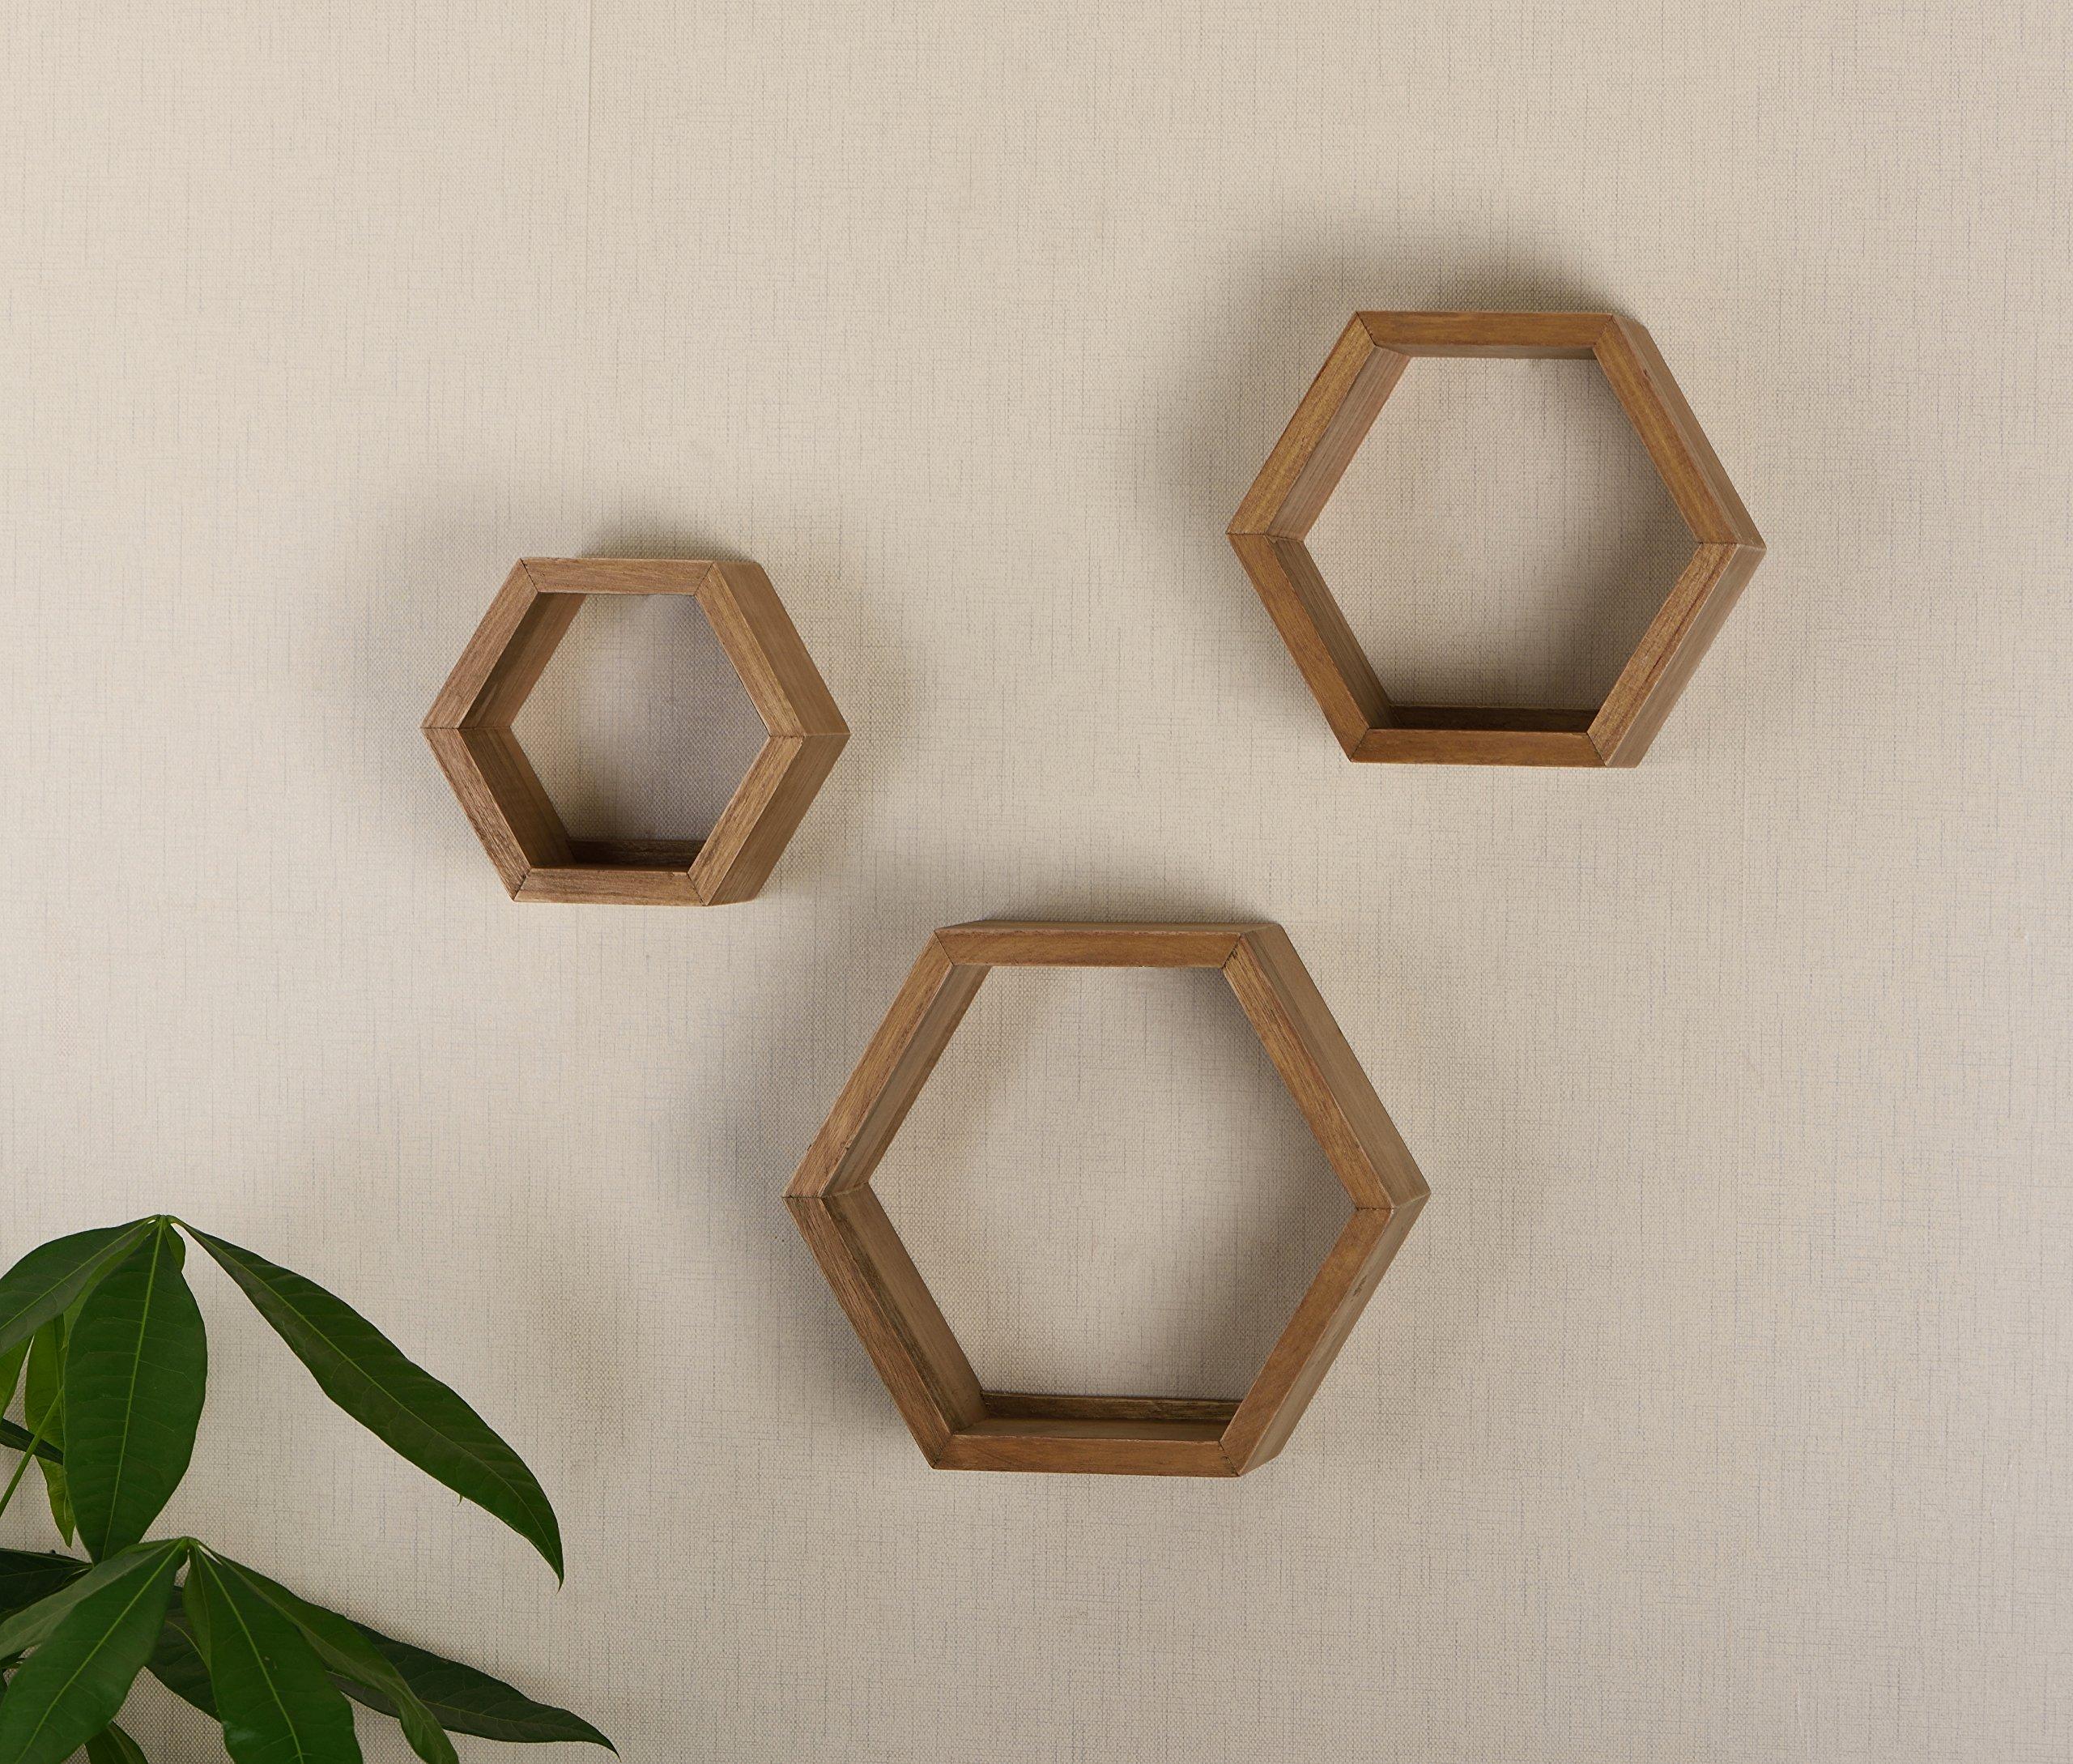 V-LIGHT Wood Wall Finish, Set of Three Cubes (VW151006O) Decorative Shelving, Oak